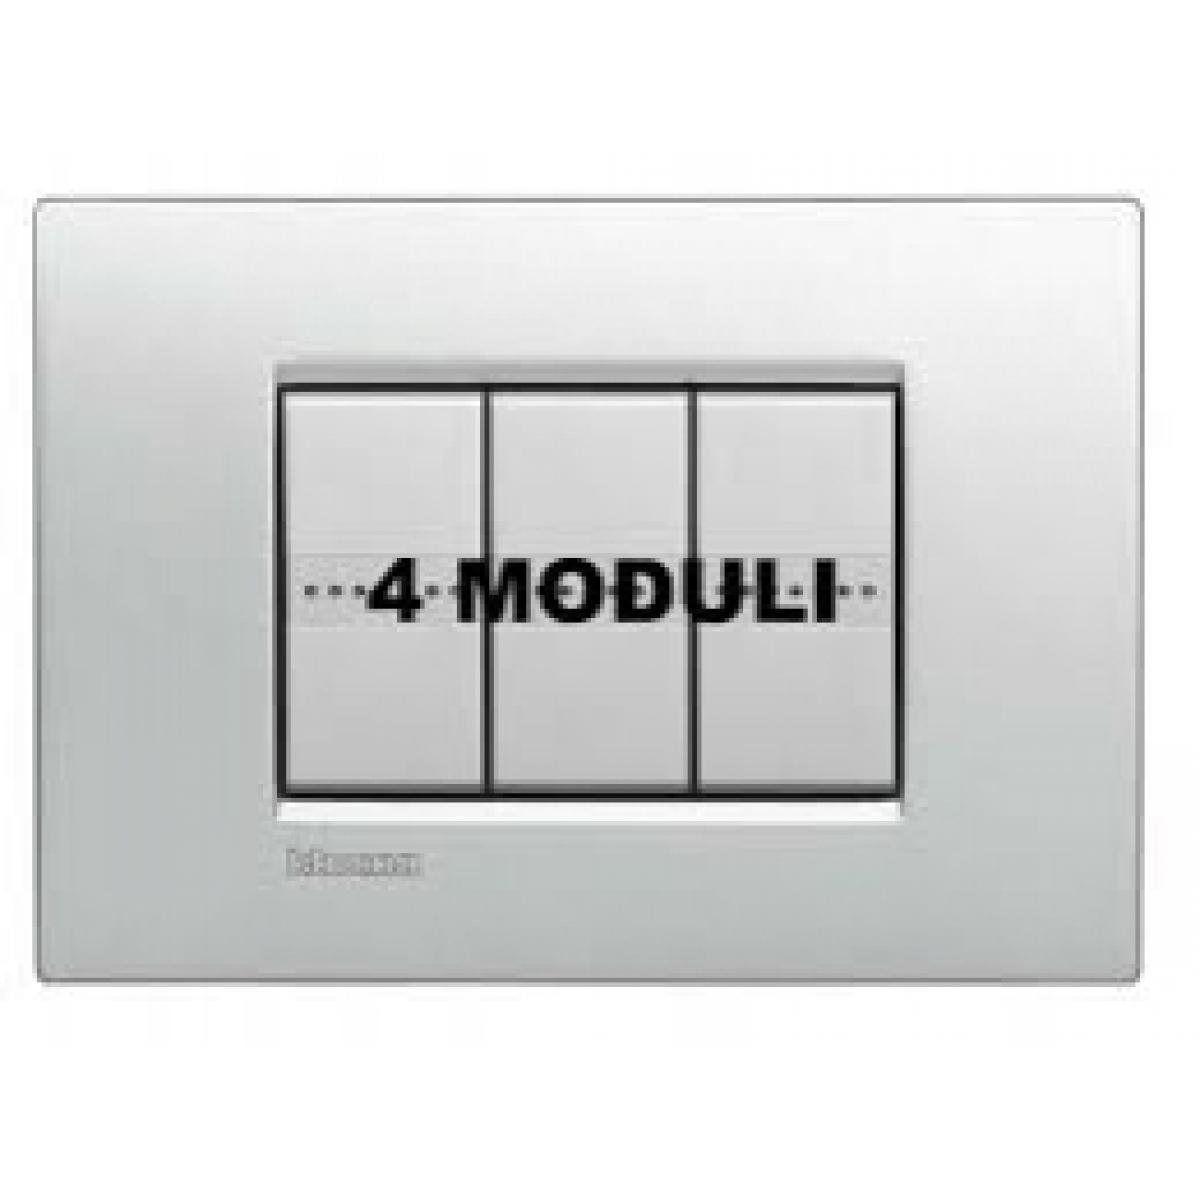 Placca 4 Moduli Tech Bticino Living Air LNC4804TE